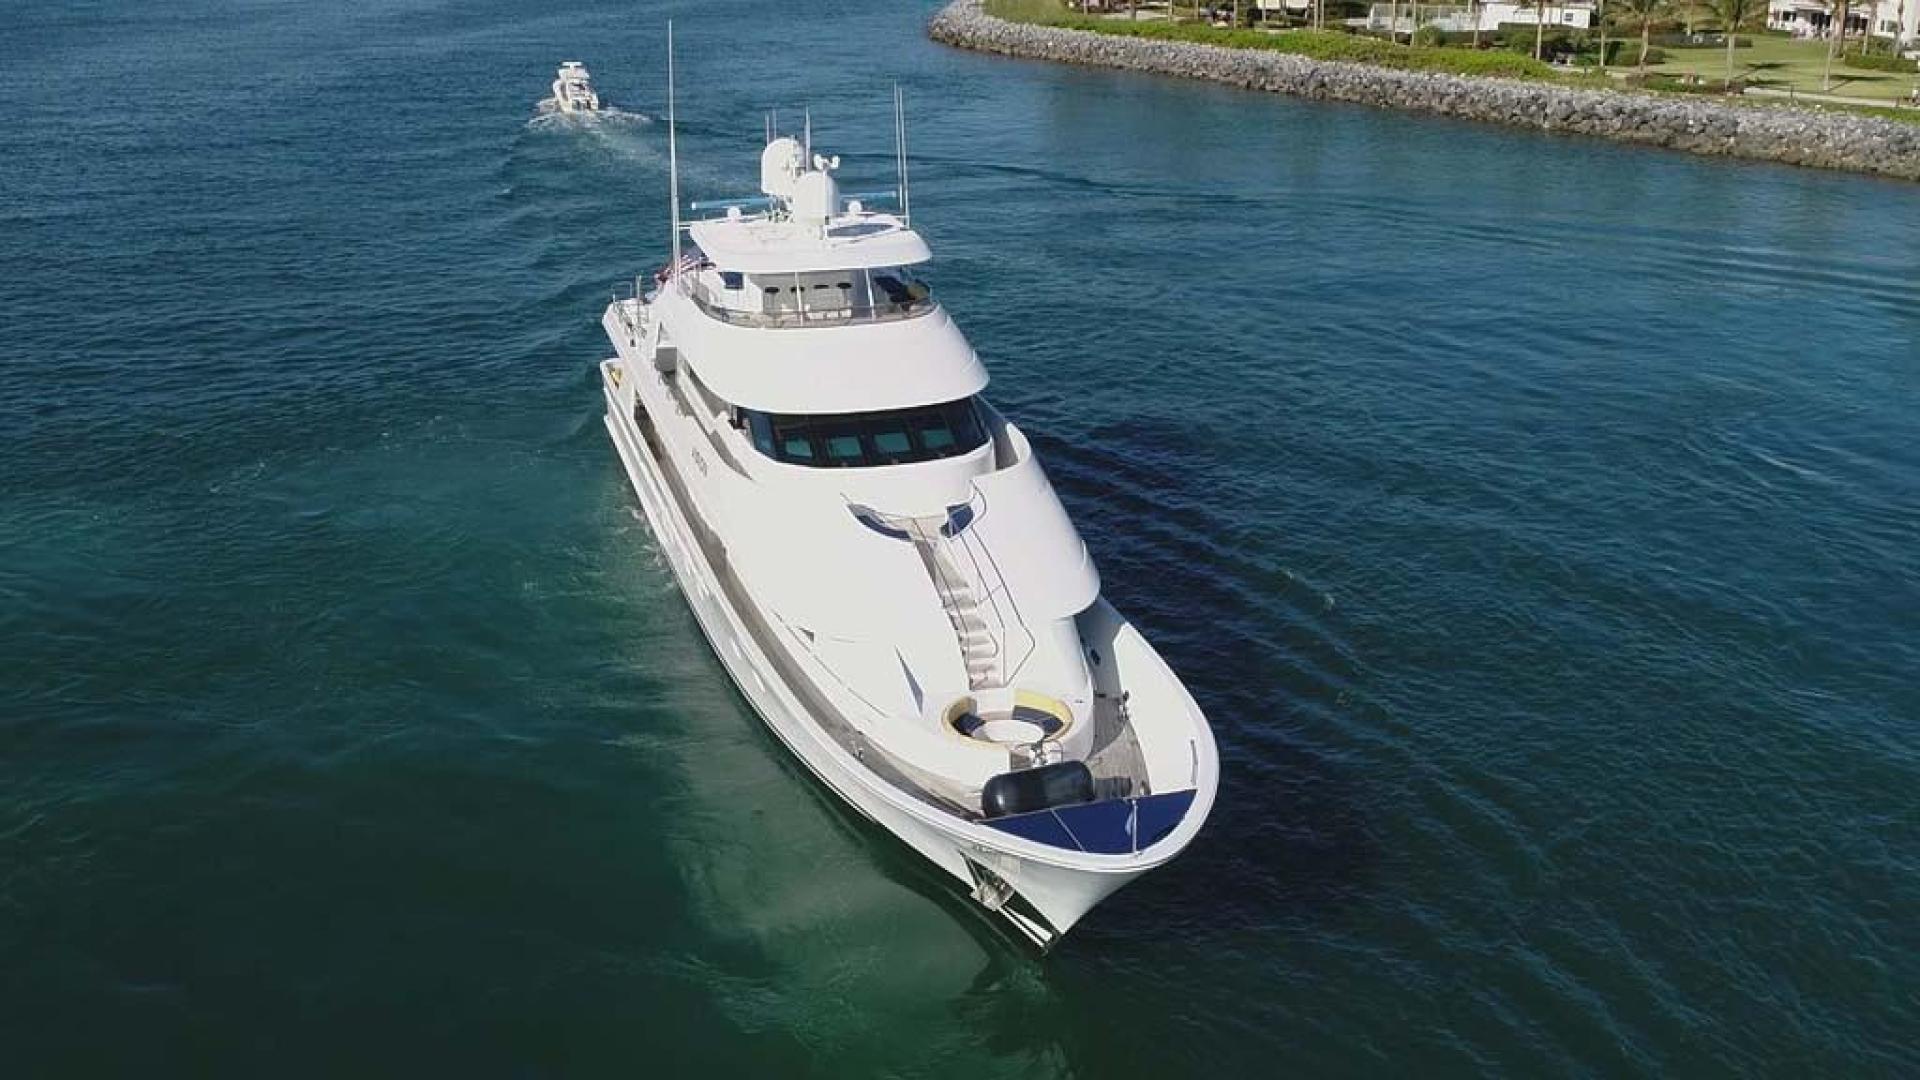 Westport-Tri-Deck 2003-Vision Jupiter-Florida-United States-Bow View-370612 | Thumbnail